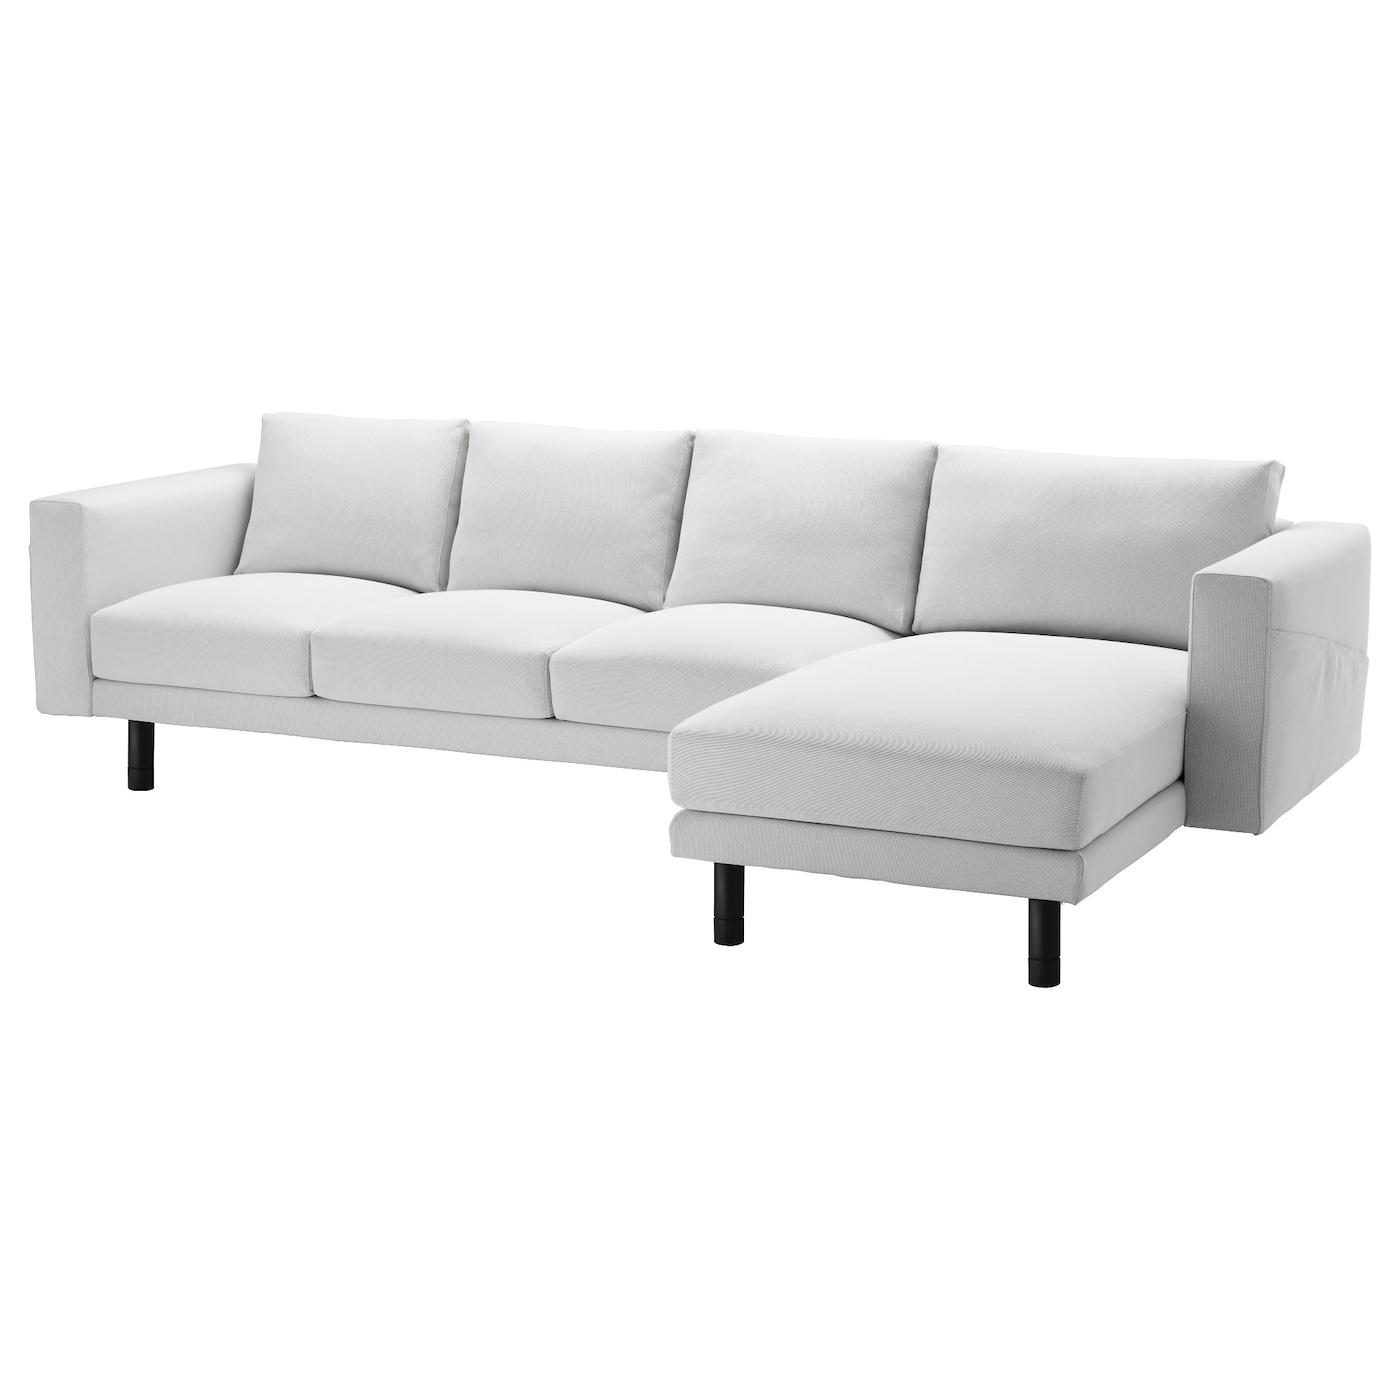 Norsborg three seat sofa and chaise longue finnsta white for 3 seat chaise sofa